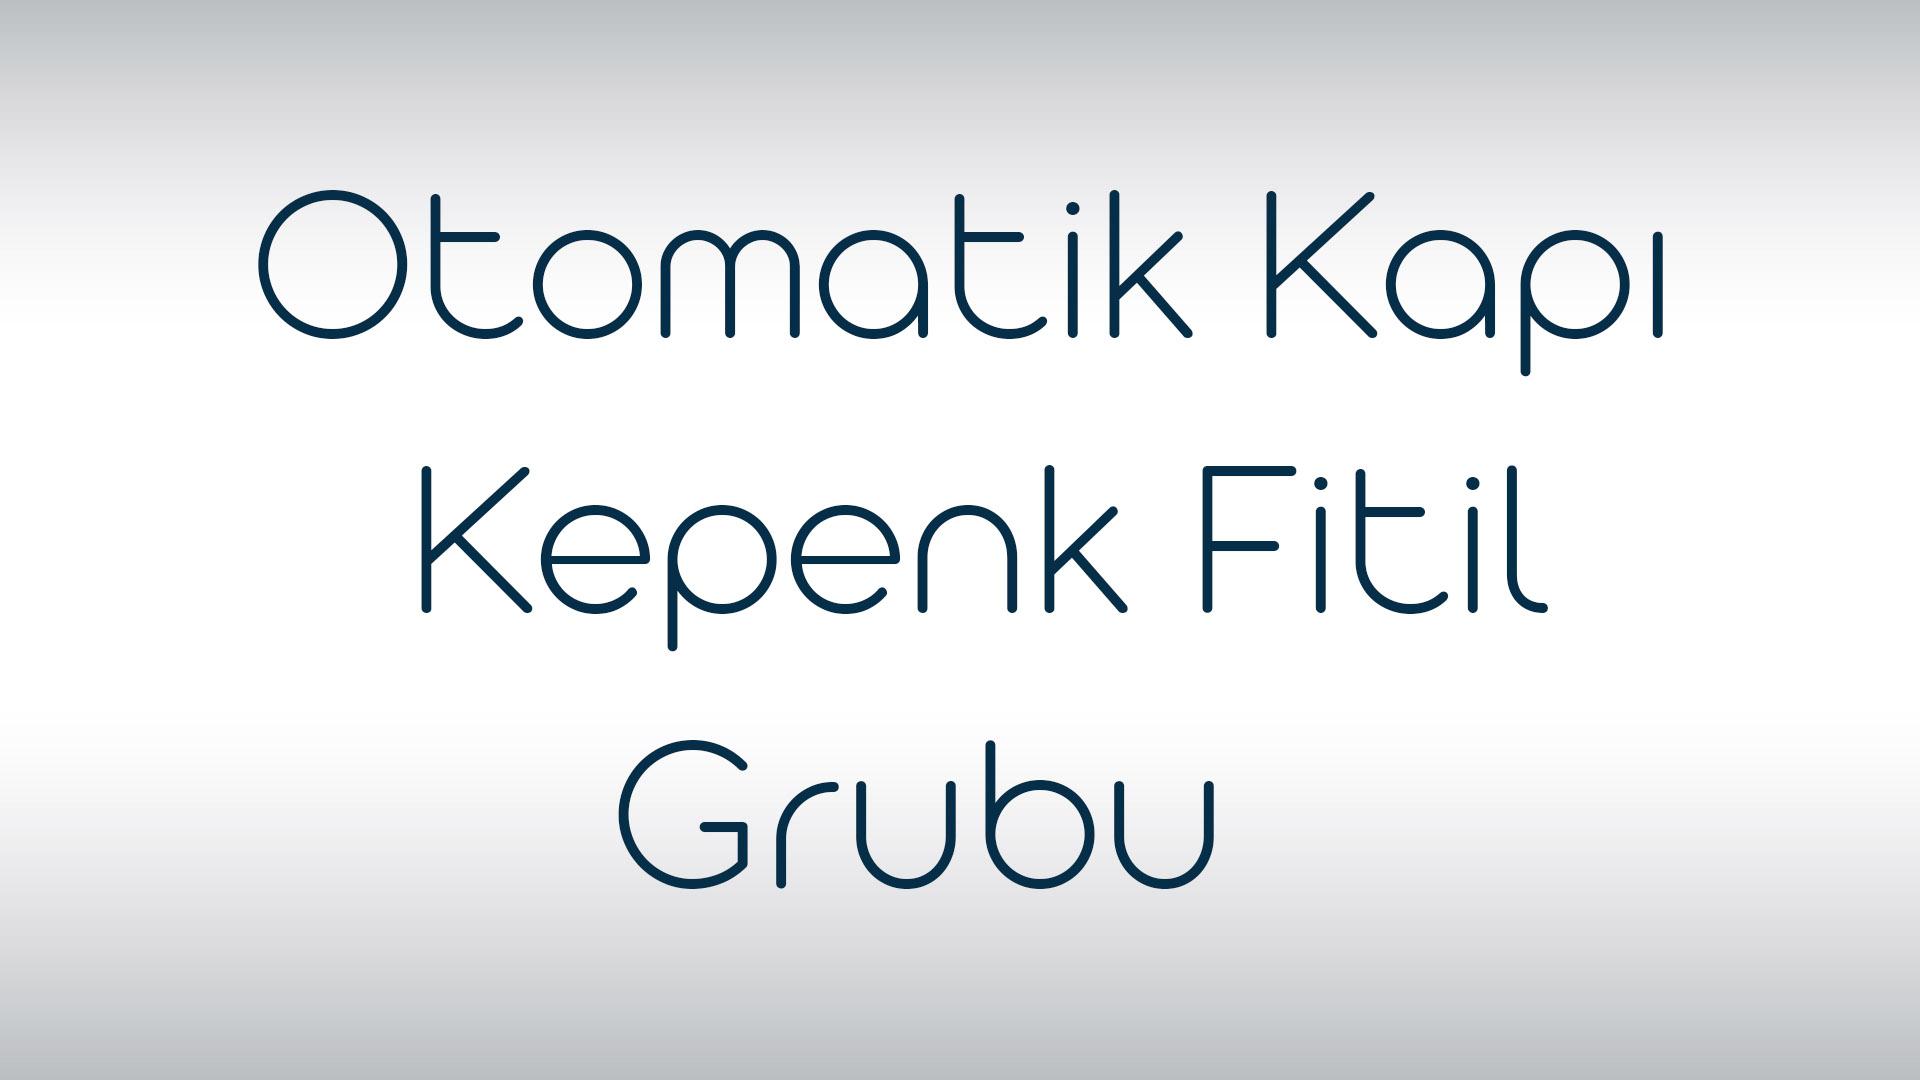 bulut_plastik_otomatik_kapı_ve_kepenk_fitil_grubu